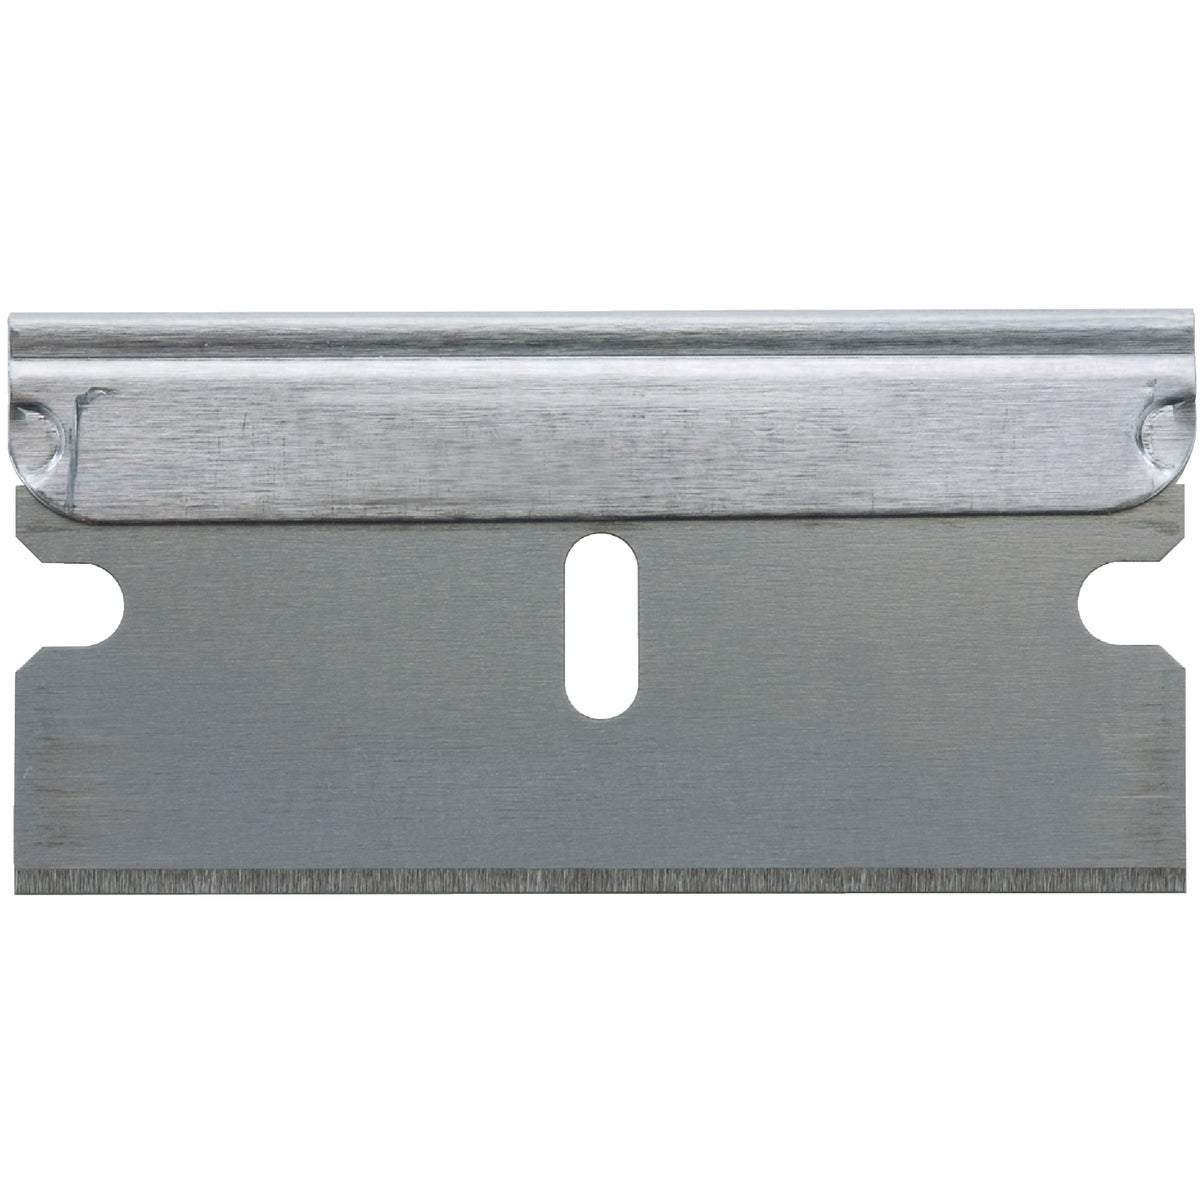 10PK RAZOR BLADE - 28-510 by Stanley Tools